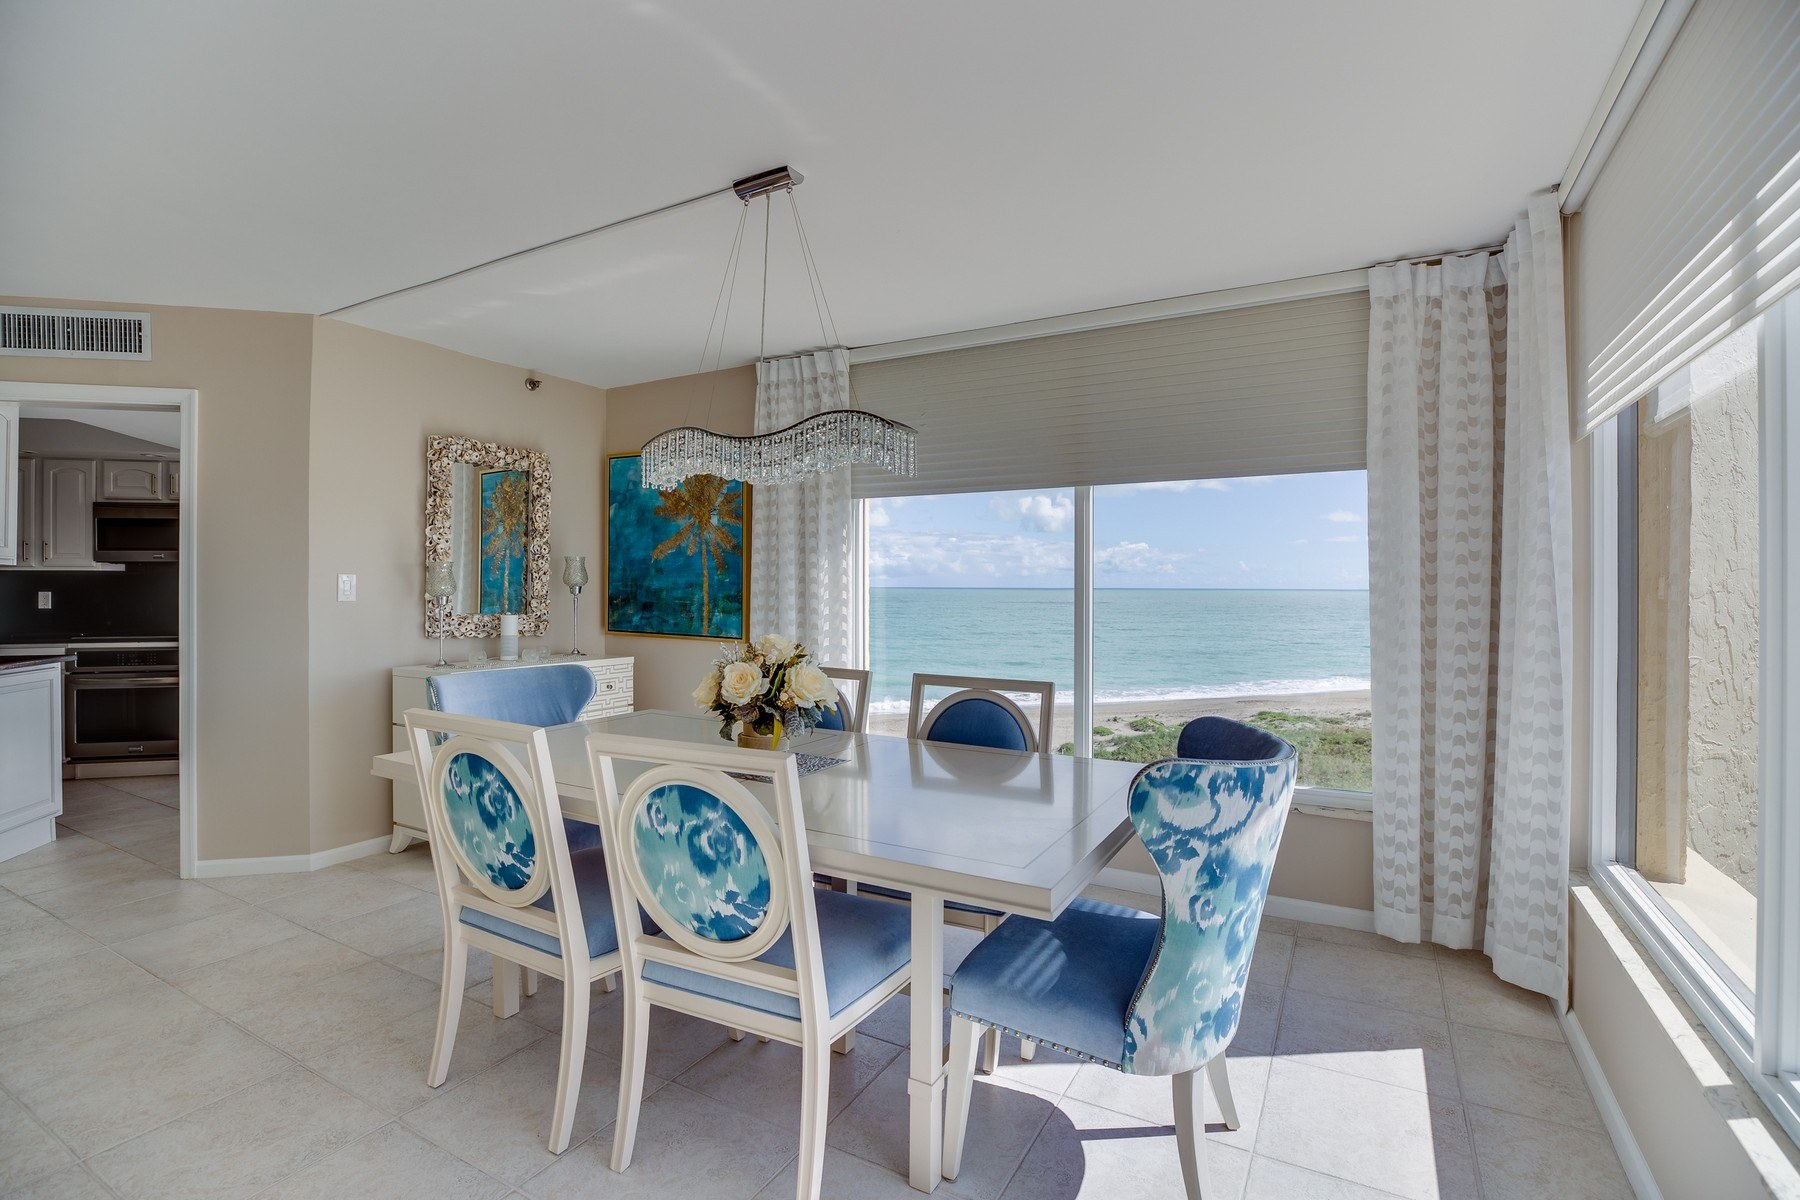 Sensational Water Views! 2400 S Ocean Drive 8174 Fort Pierce, Florida 34949 Hoa Kỳ